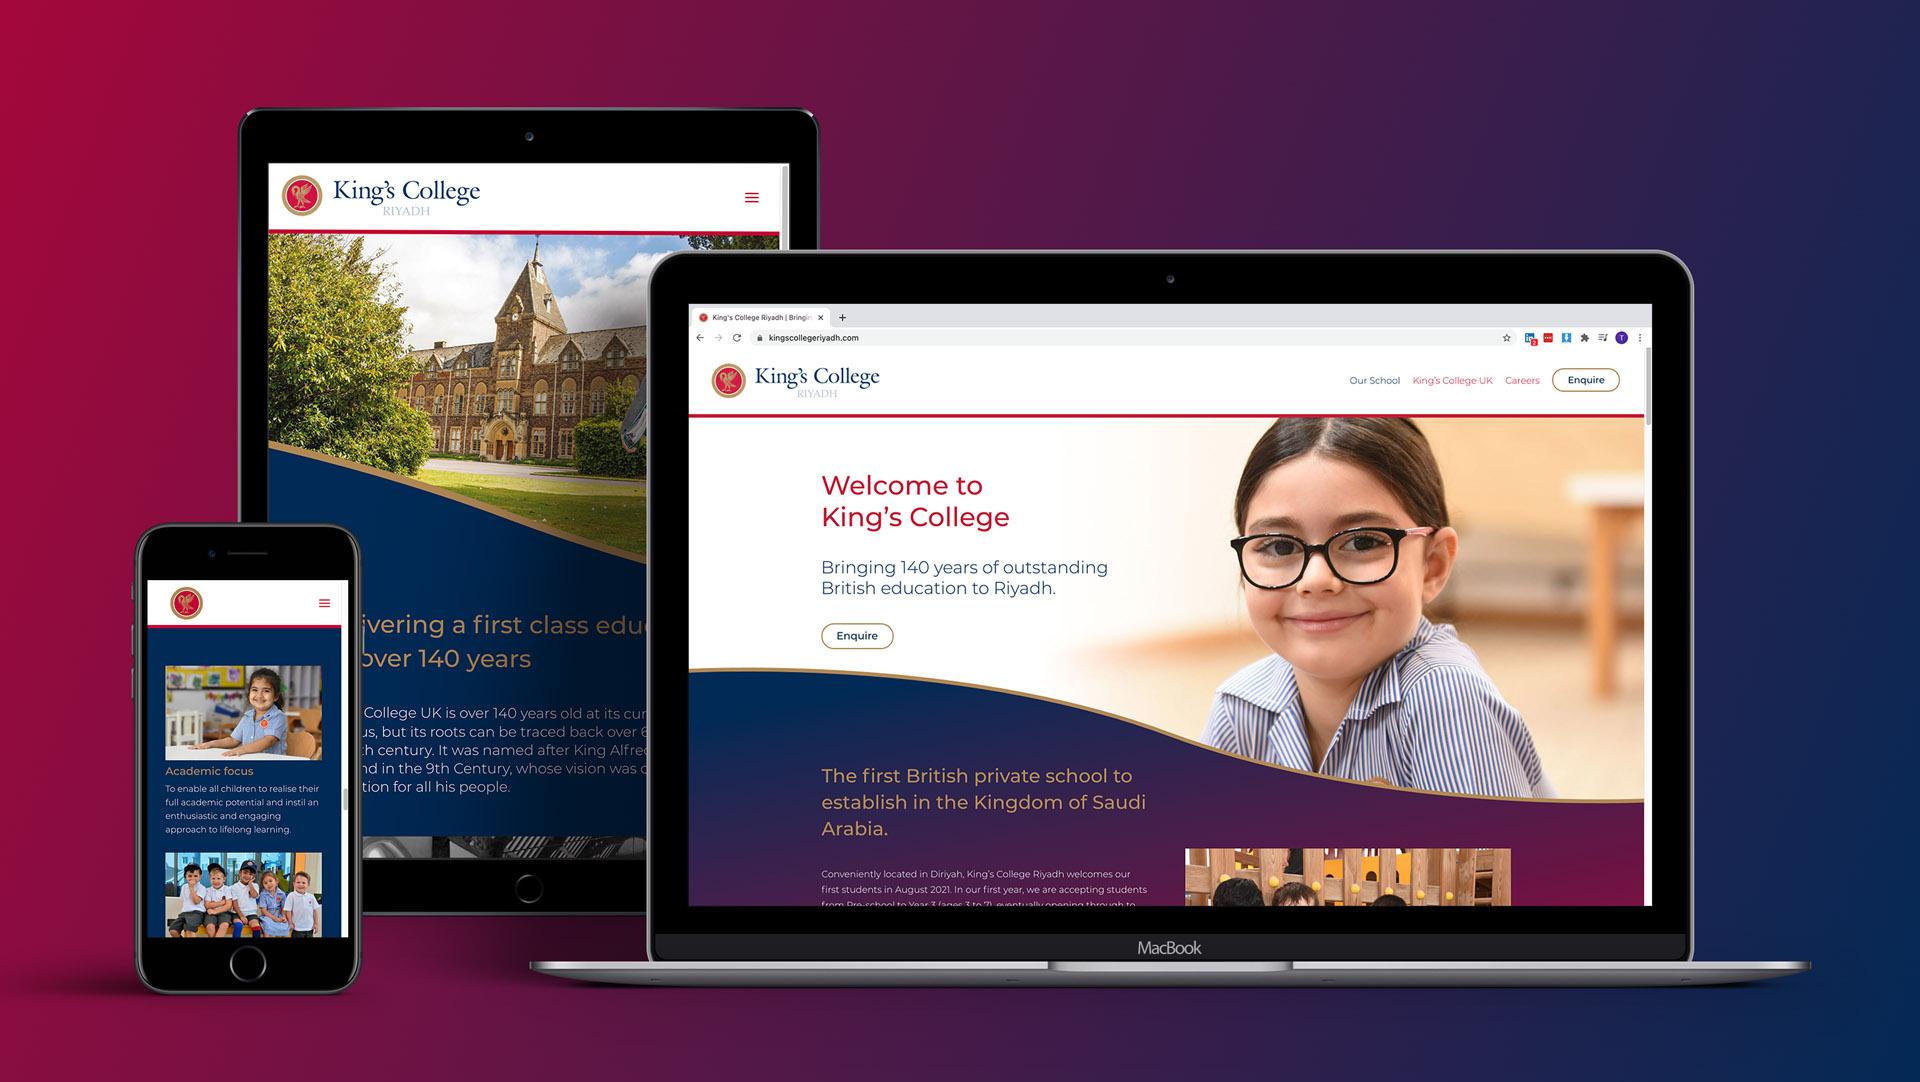 King's College Riyadh website